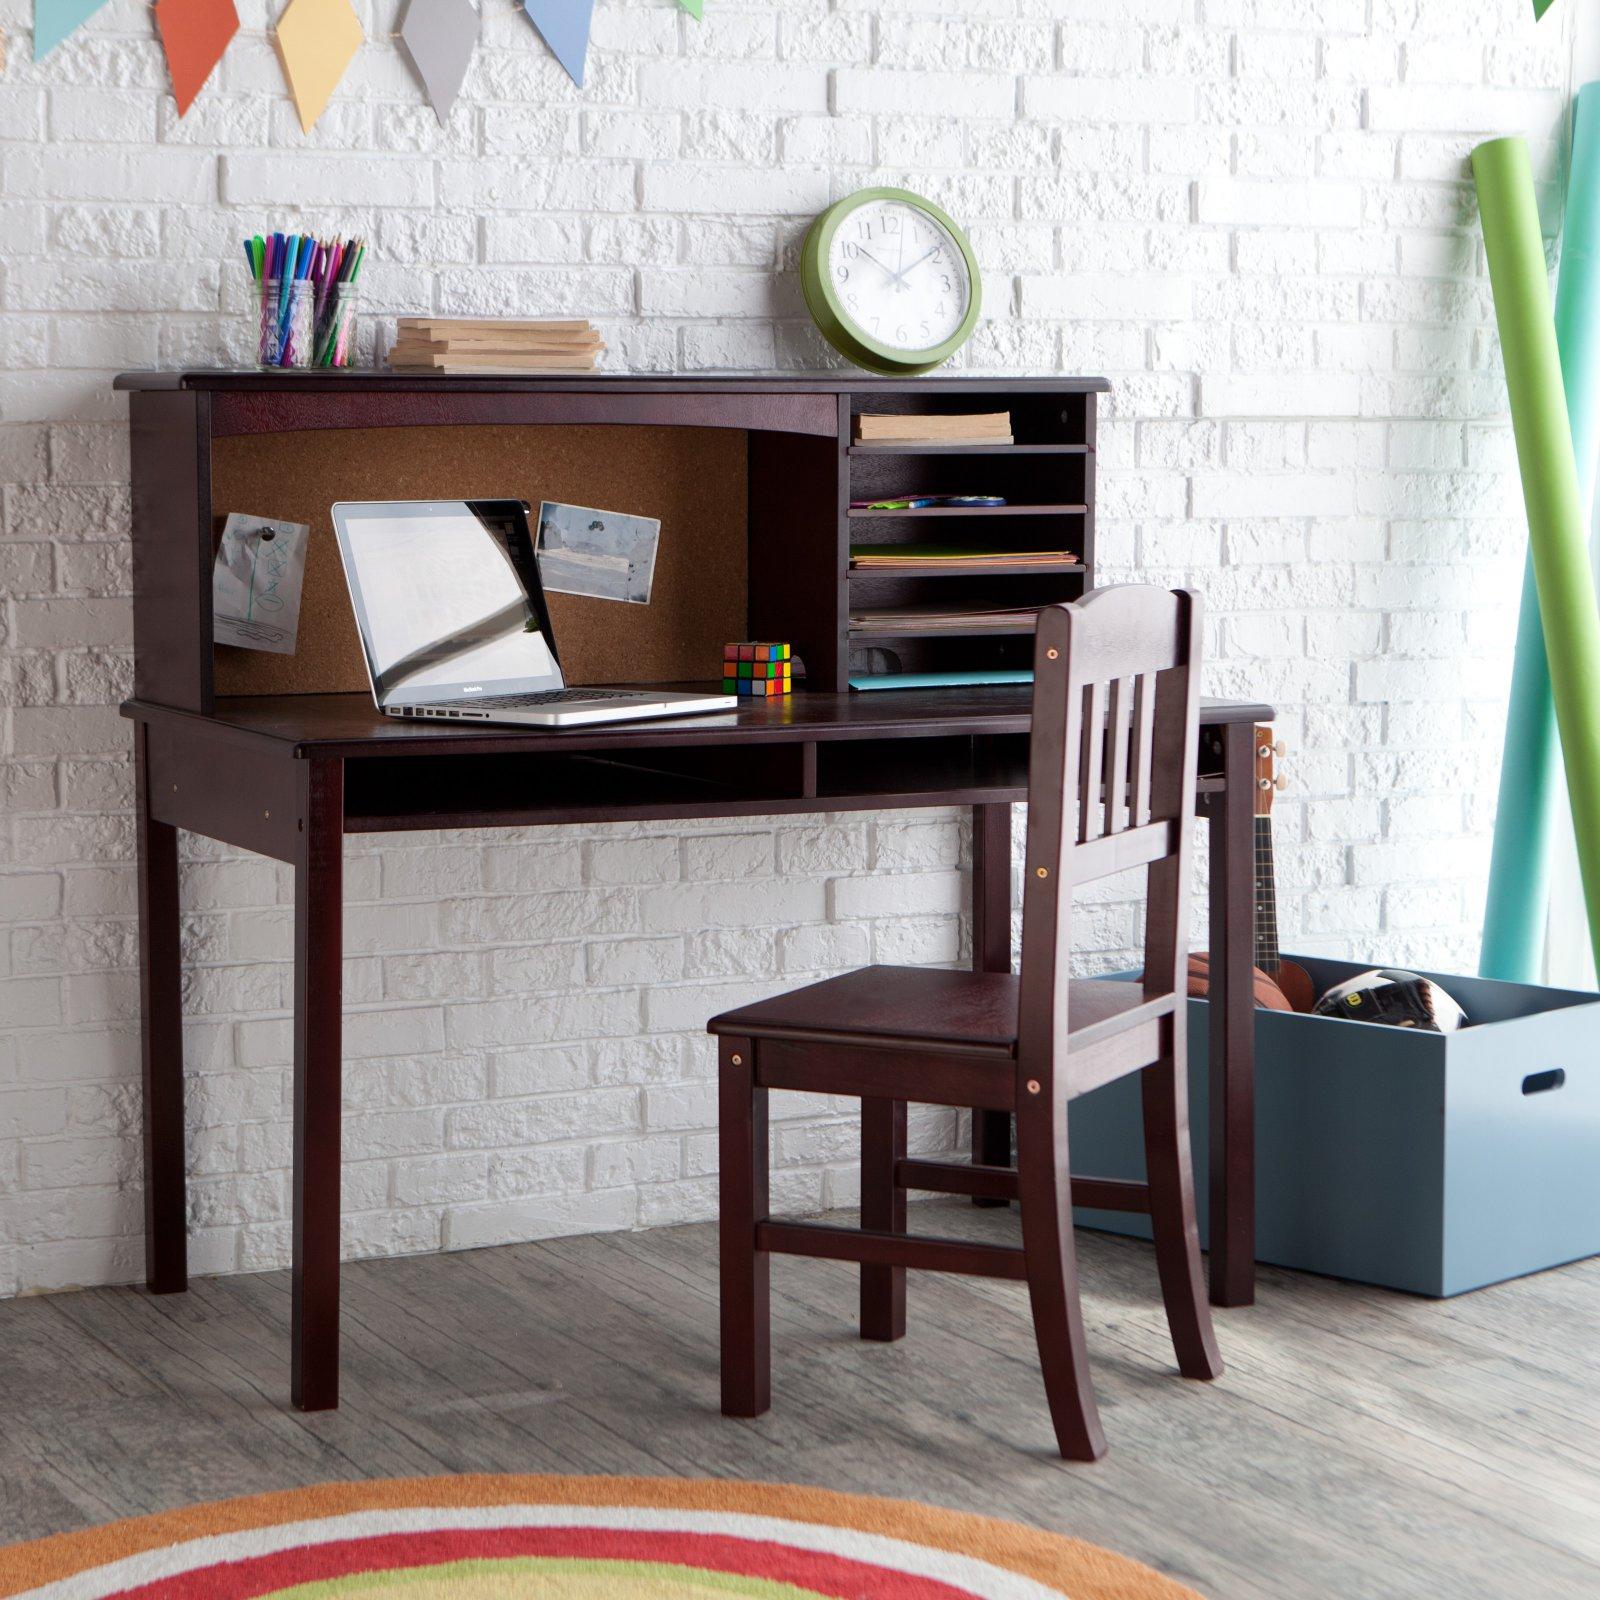 Guidecraft Media Desk & Chair Set - Espresso